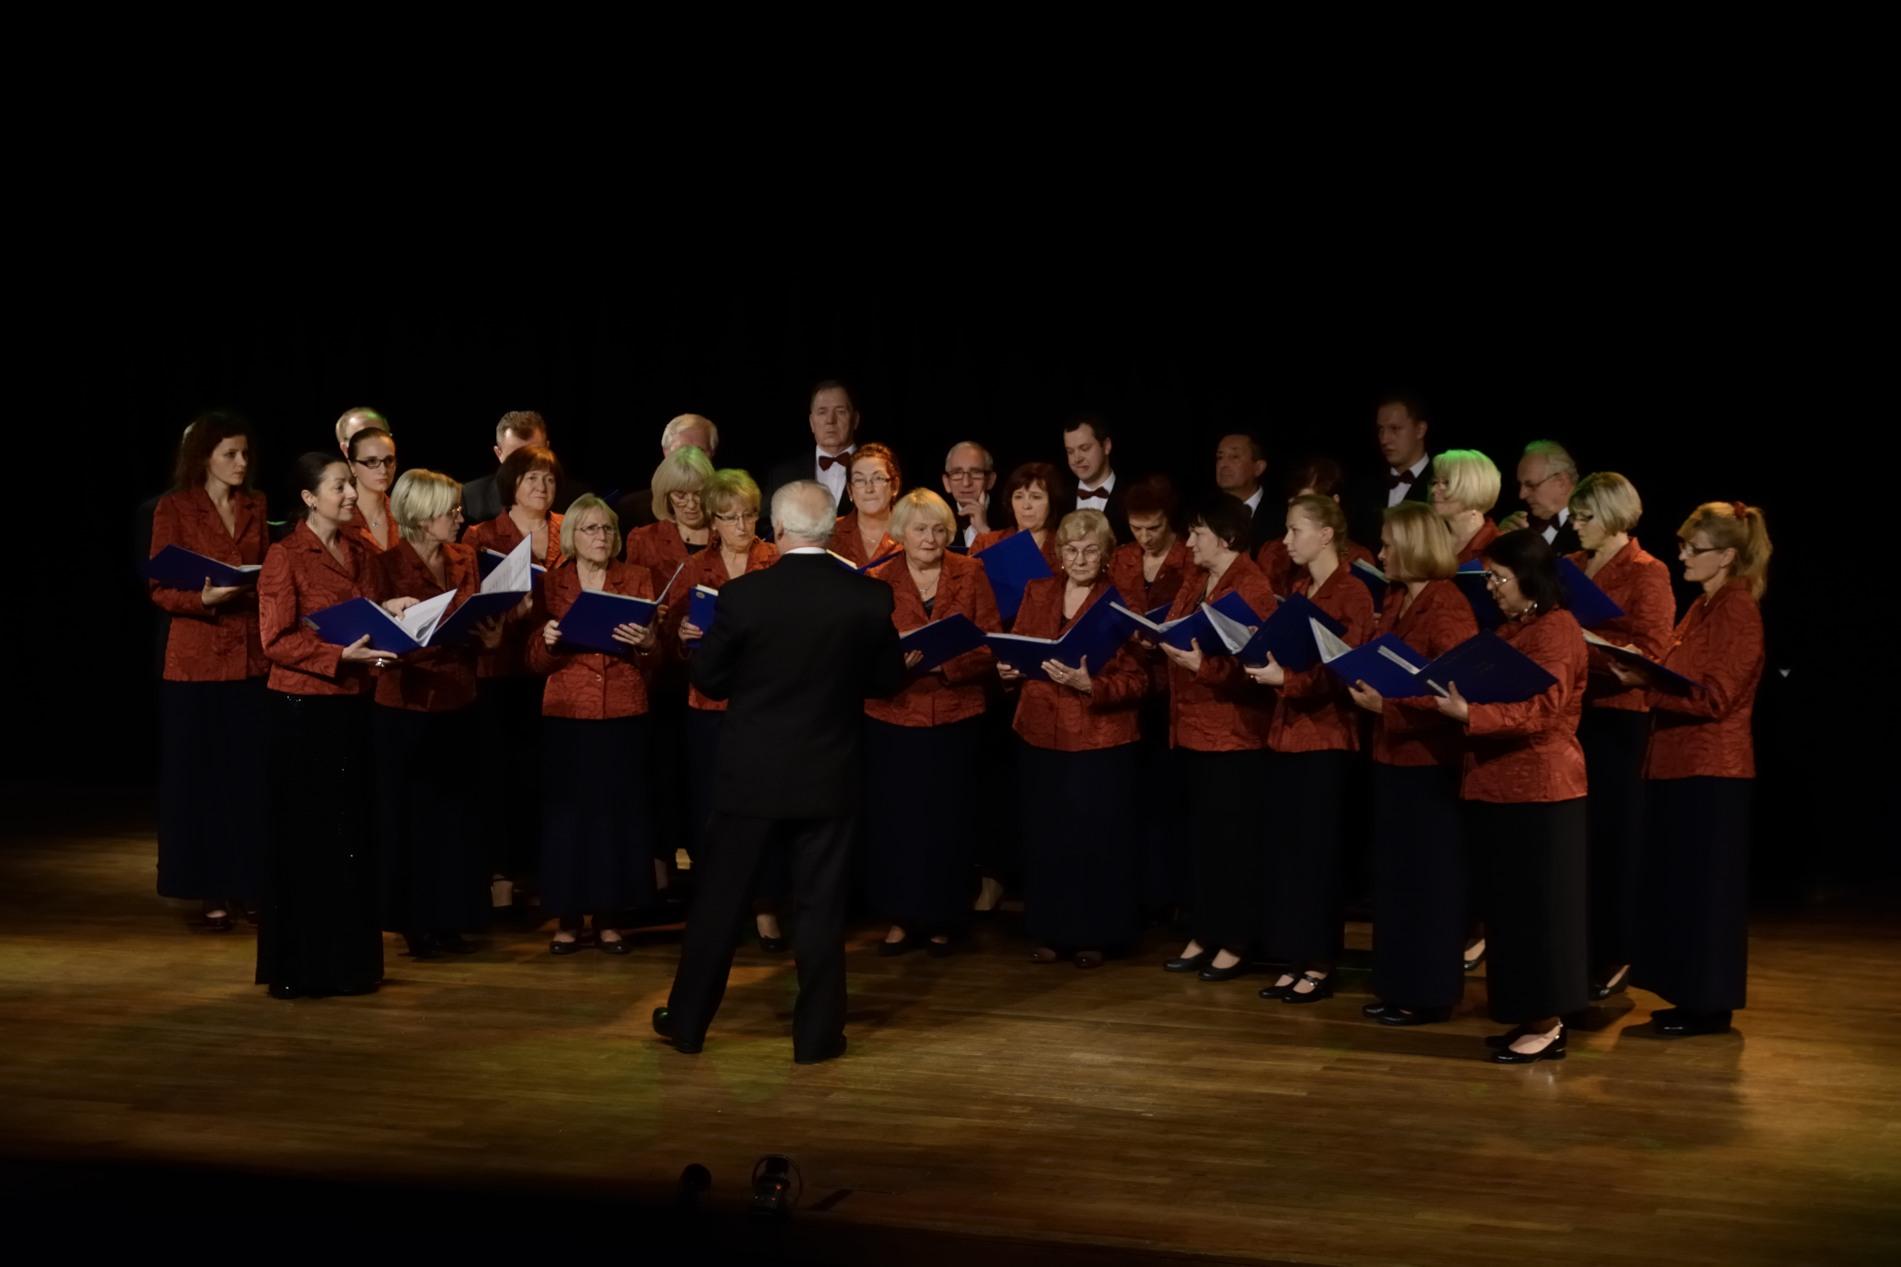 Paris chorale 2013